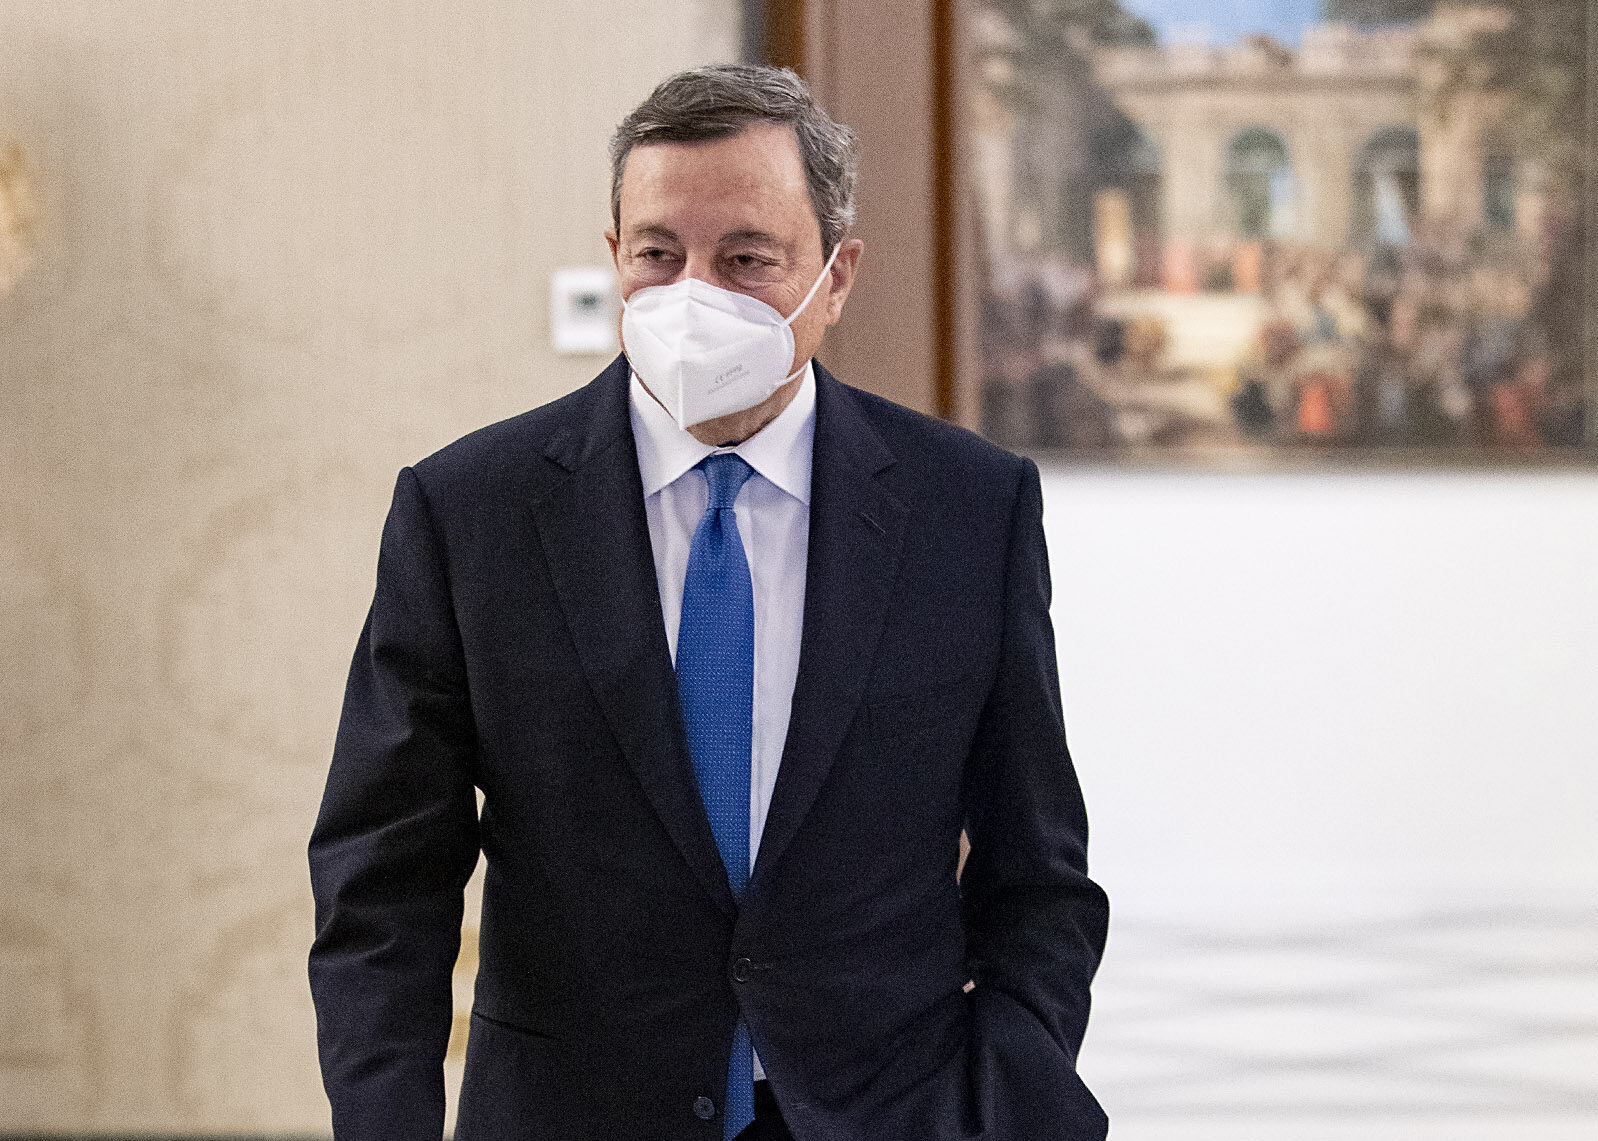 Mario Draghi的磋商進行得如何。 《開始》雜誌特輯